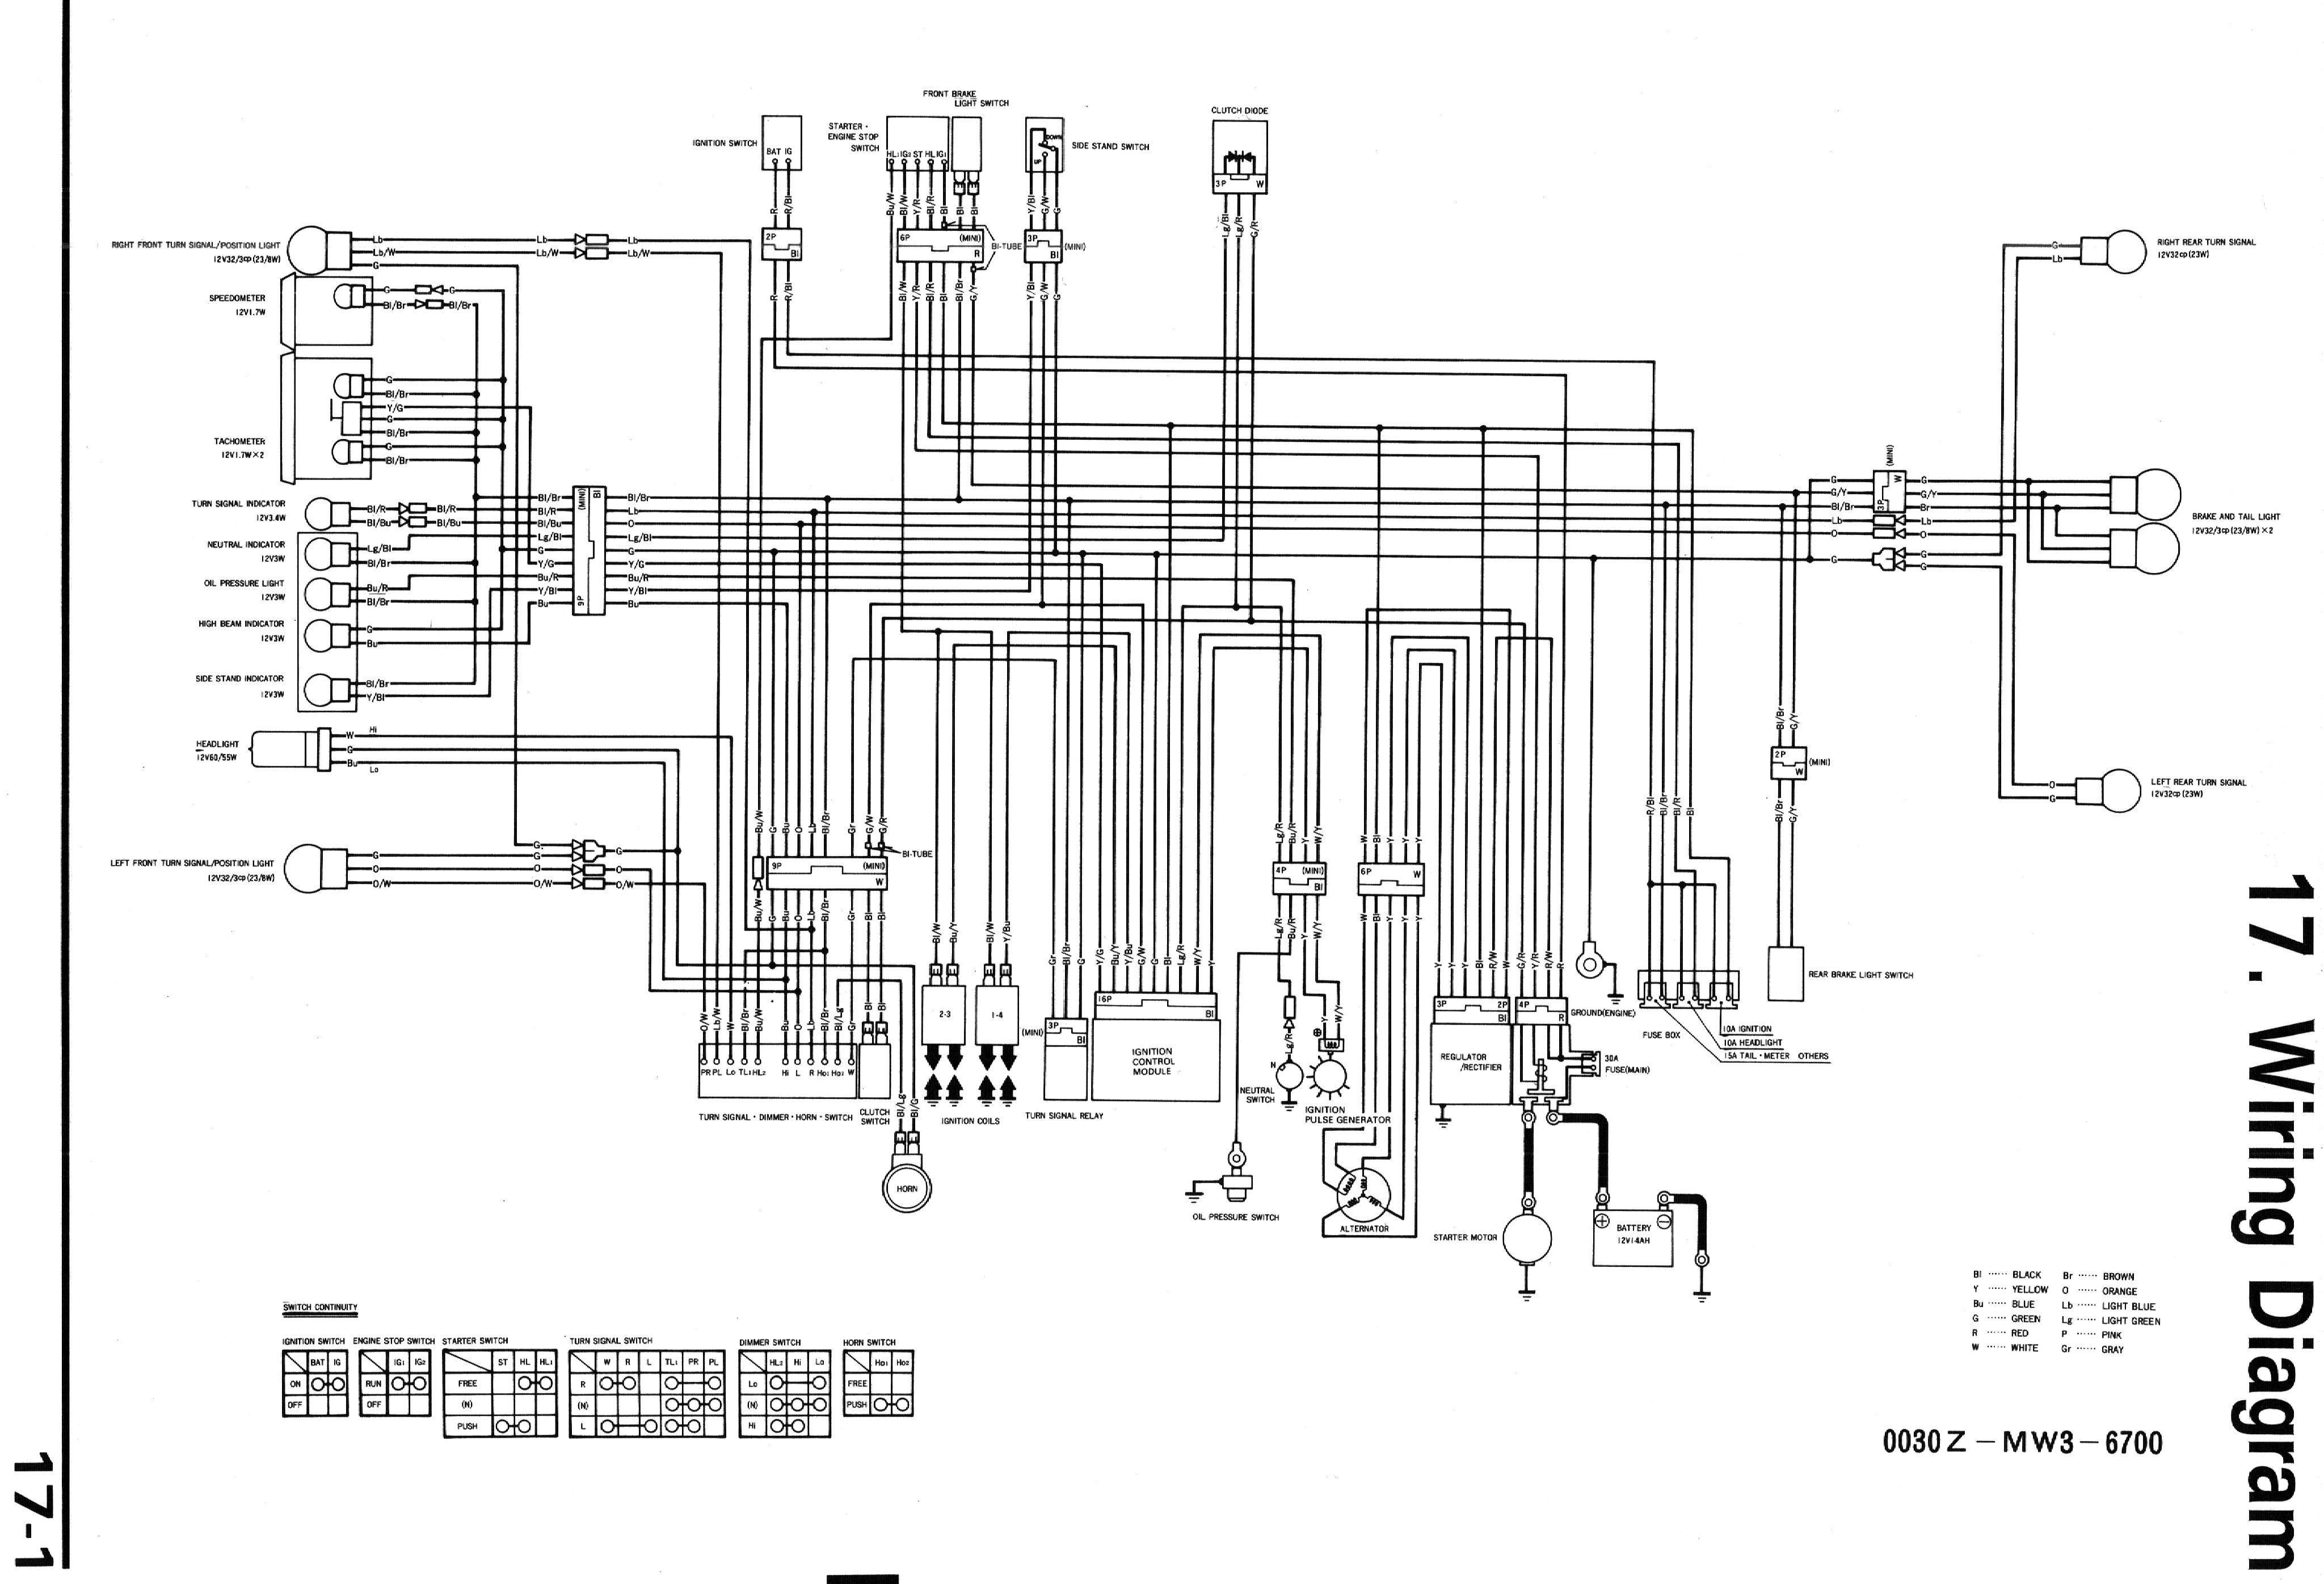 nighthawk 750 wiring diagram free vehicle wiring diagrams u2022 rh generalinfo co